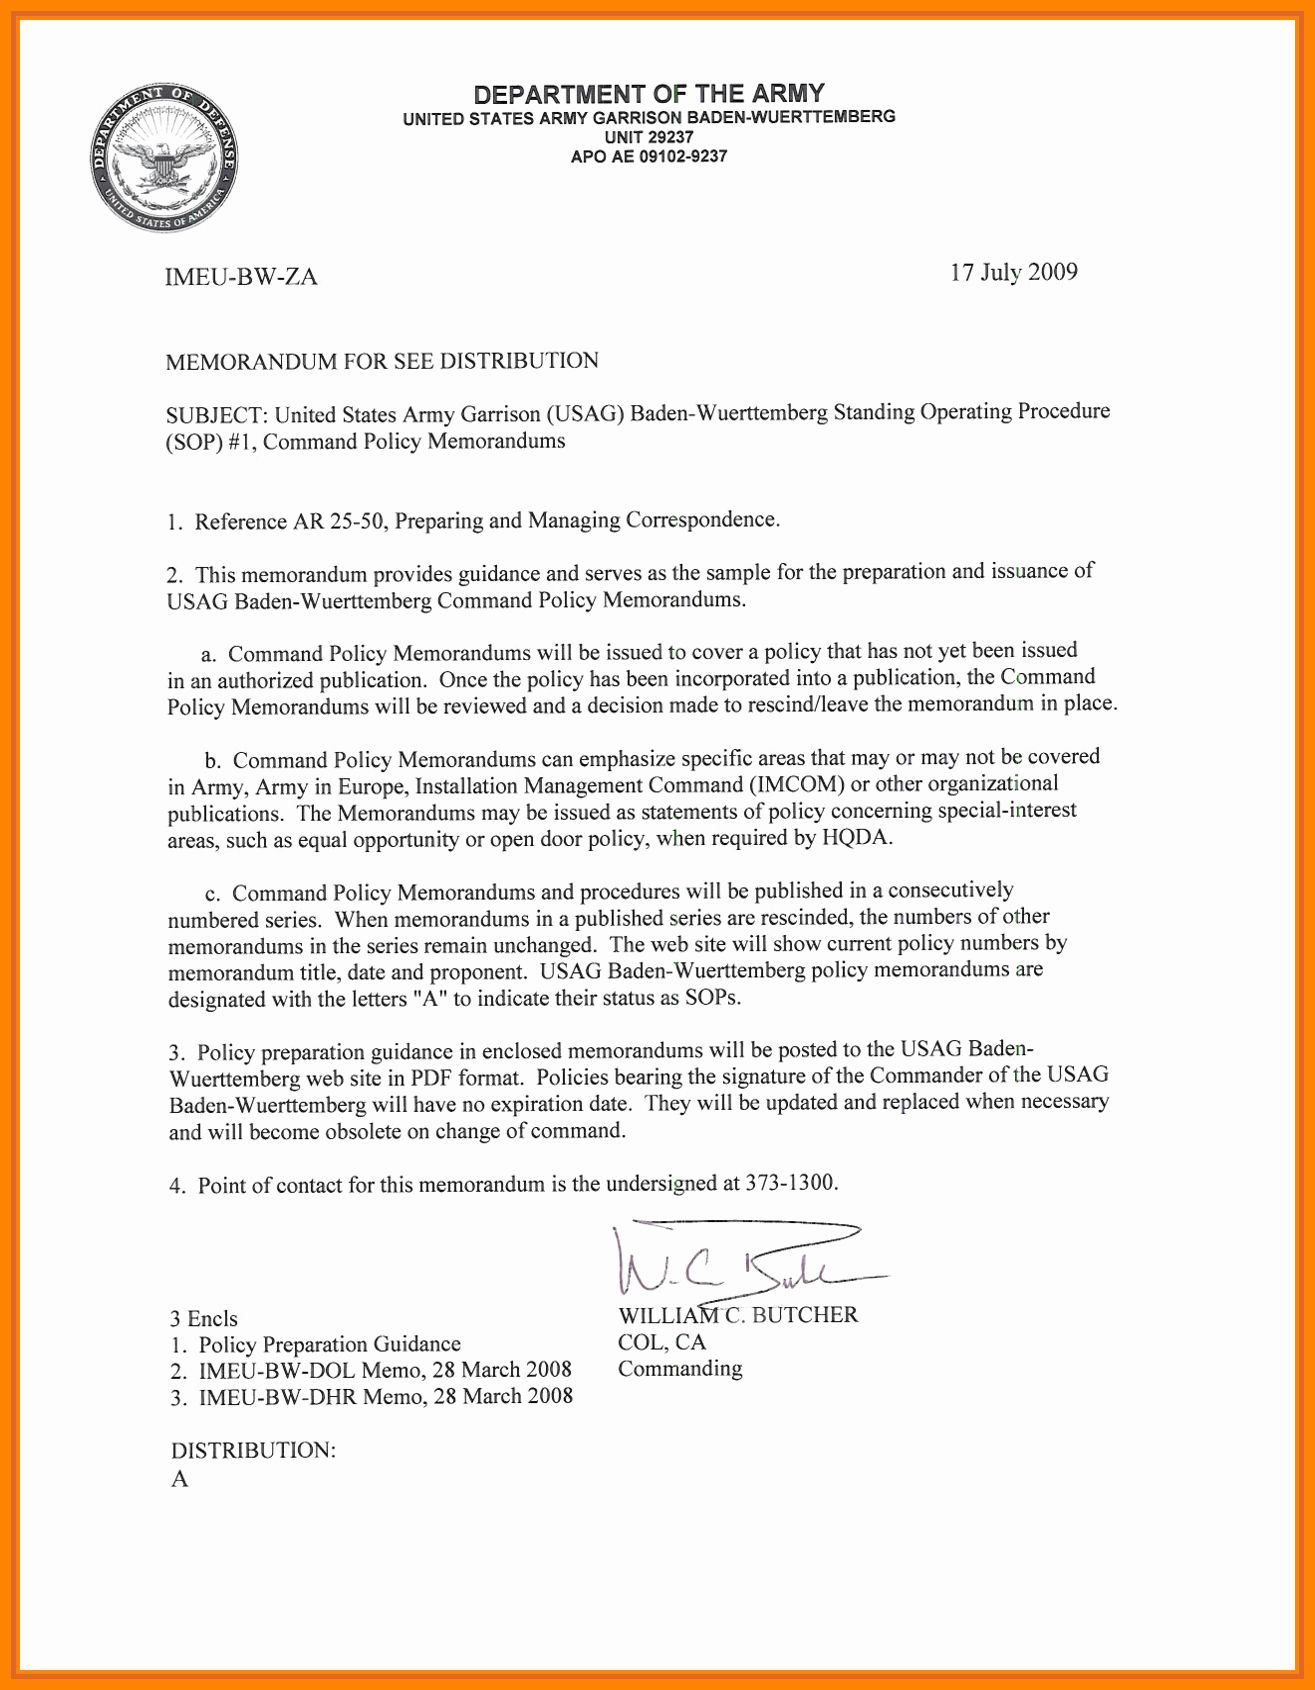 Army Memorandum For Record Template Luxury 15 Memorandum Of Record Army Memorandum Template Letterhead Template Memo Format